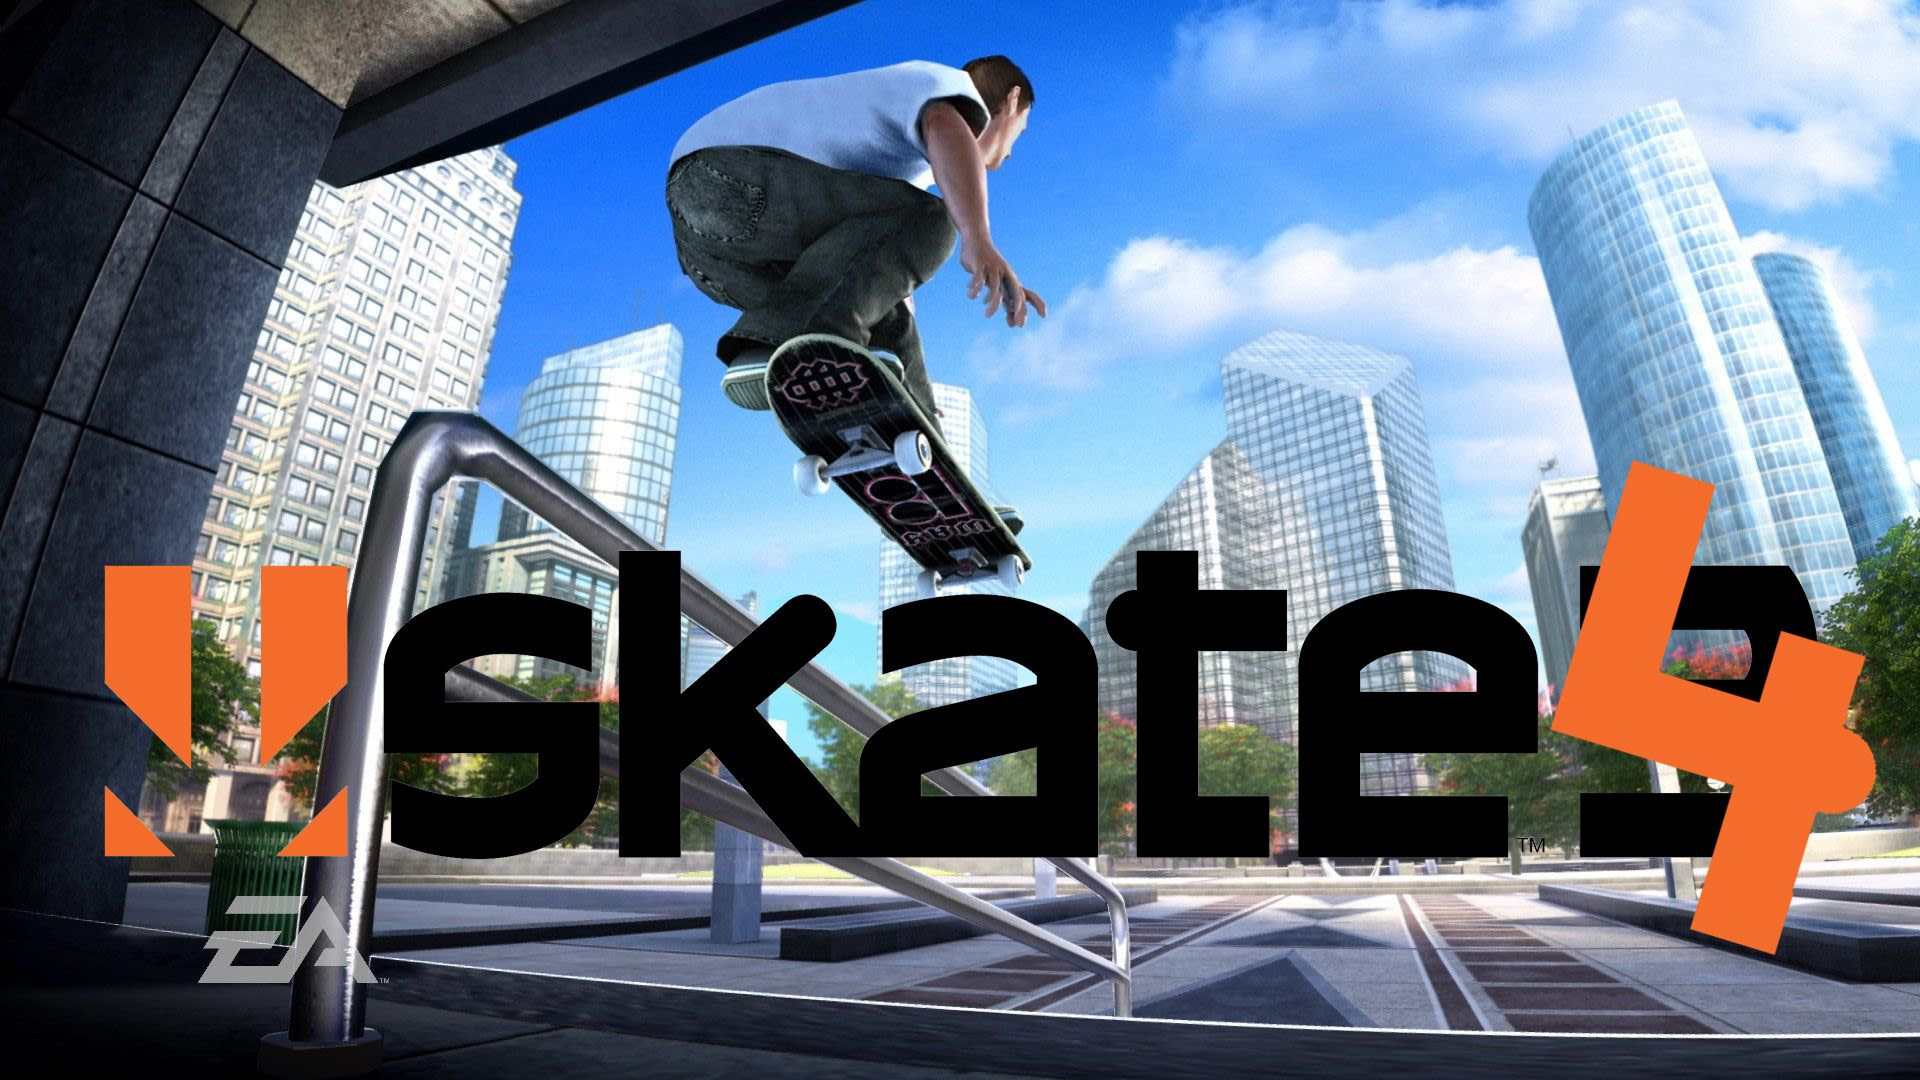 Skate 4 Logo